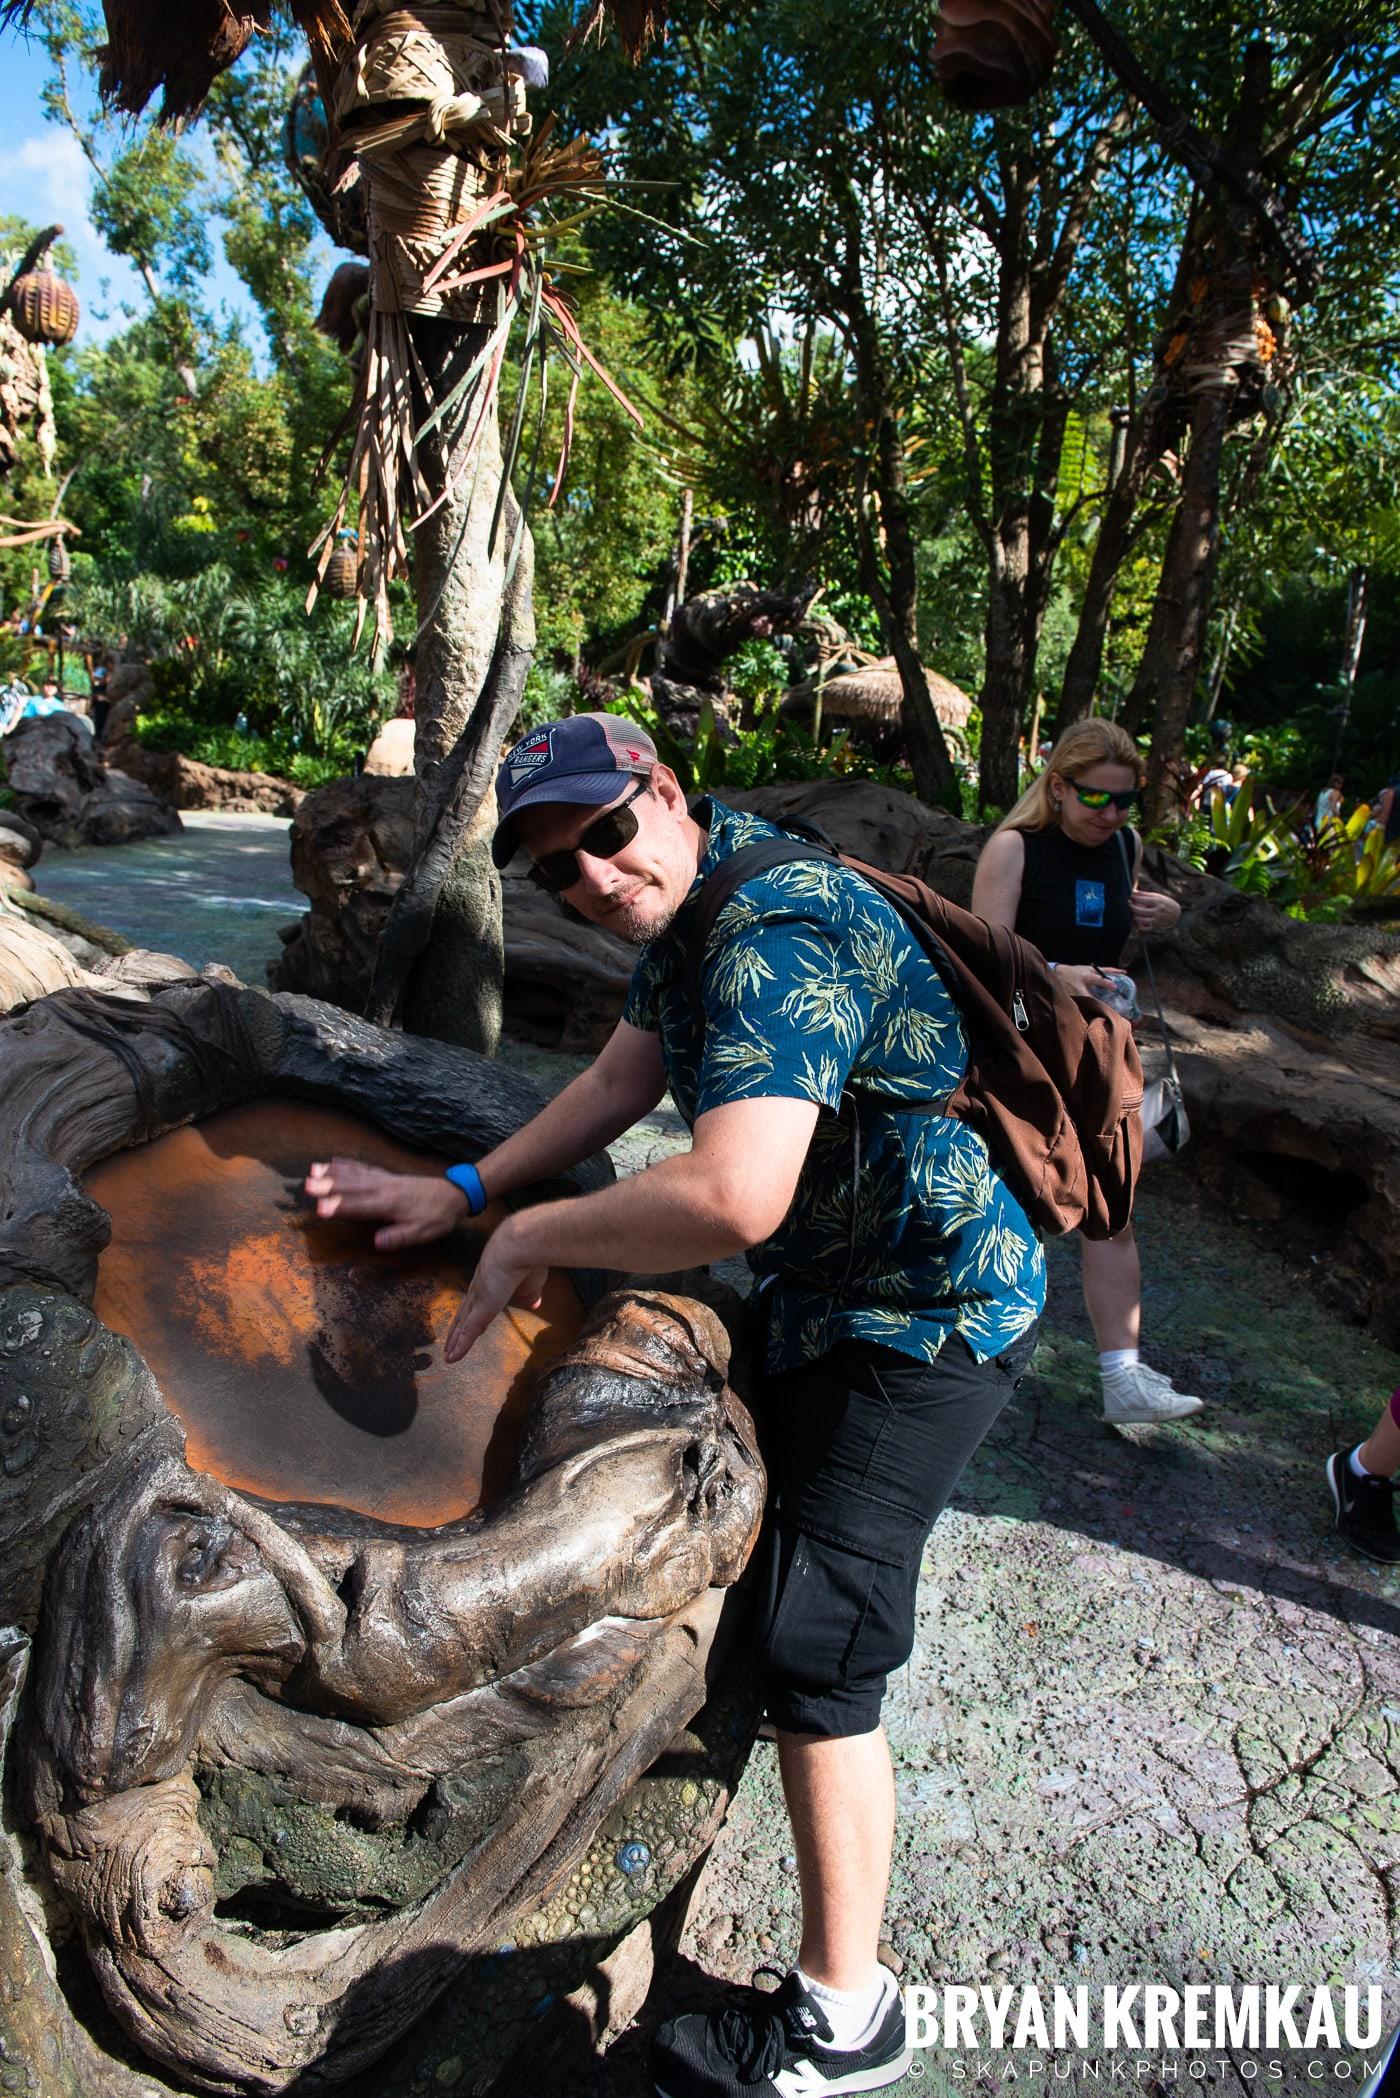 Walt Disney World Vacation: Day 5 (Animal Kingdom / Disney's Hollywood Studios) - 10.3.19 (58)